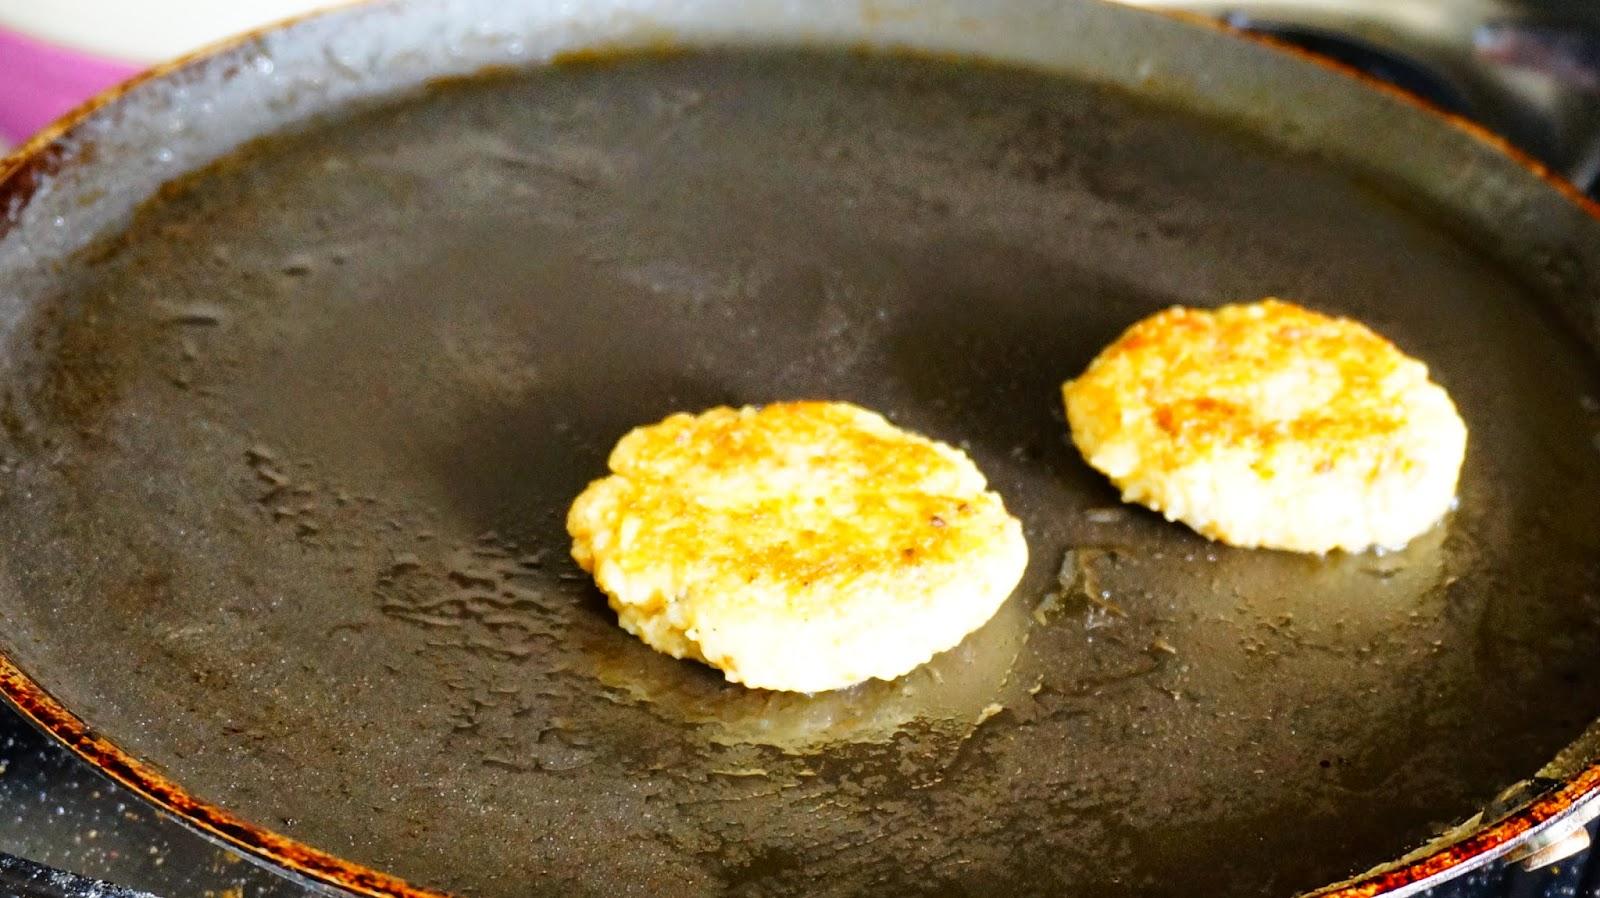 Leftoverrecipes,Bengalgramcutlets,ricecutlets,leftoverbengalgramcutlets,tikki,cutlets,pancake